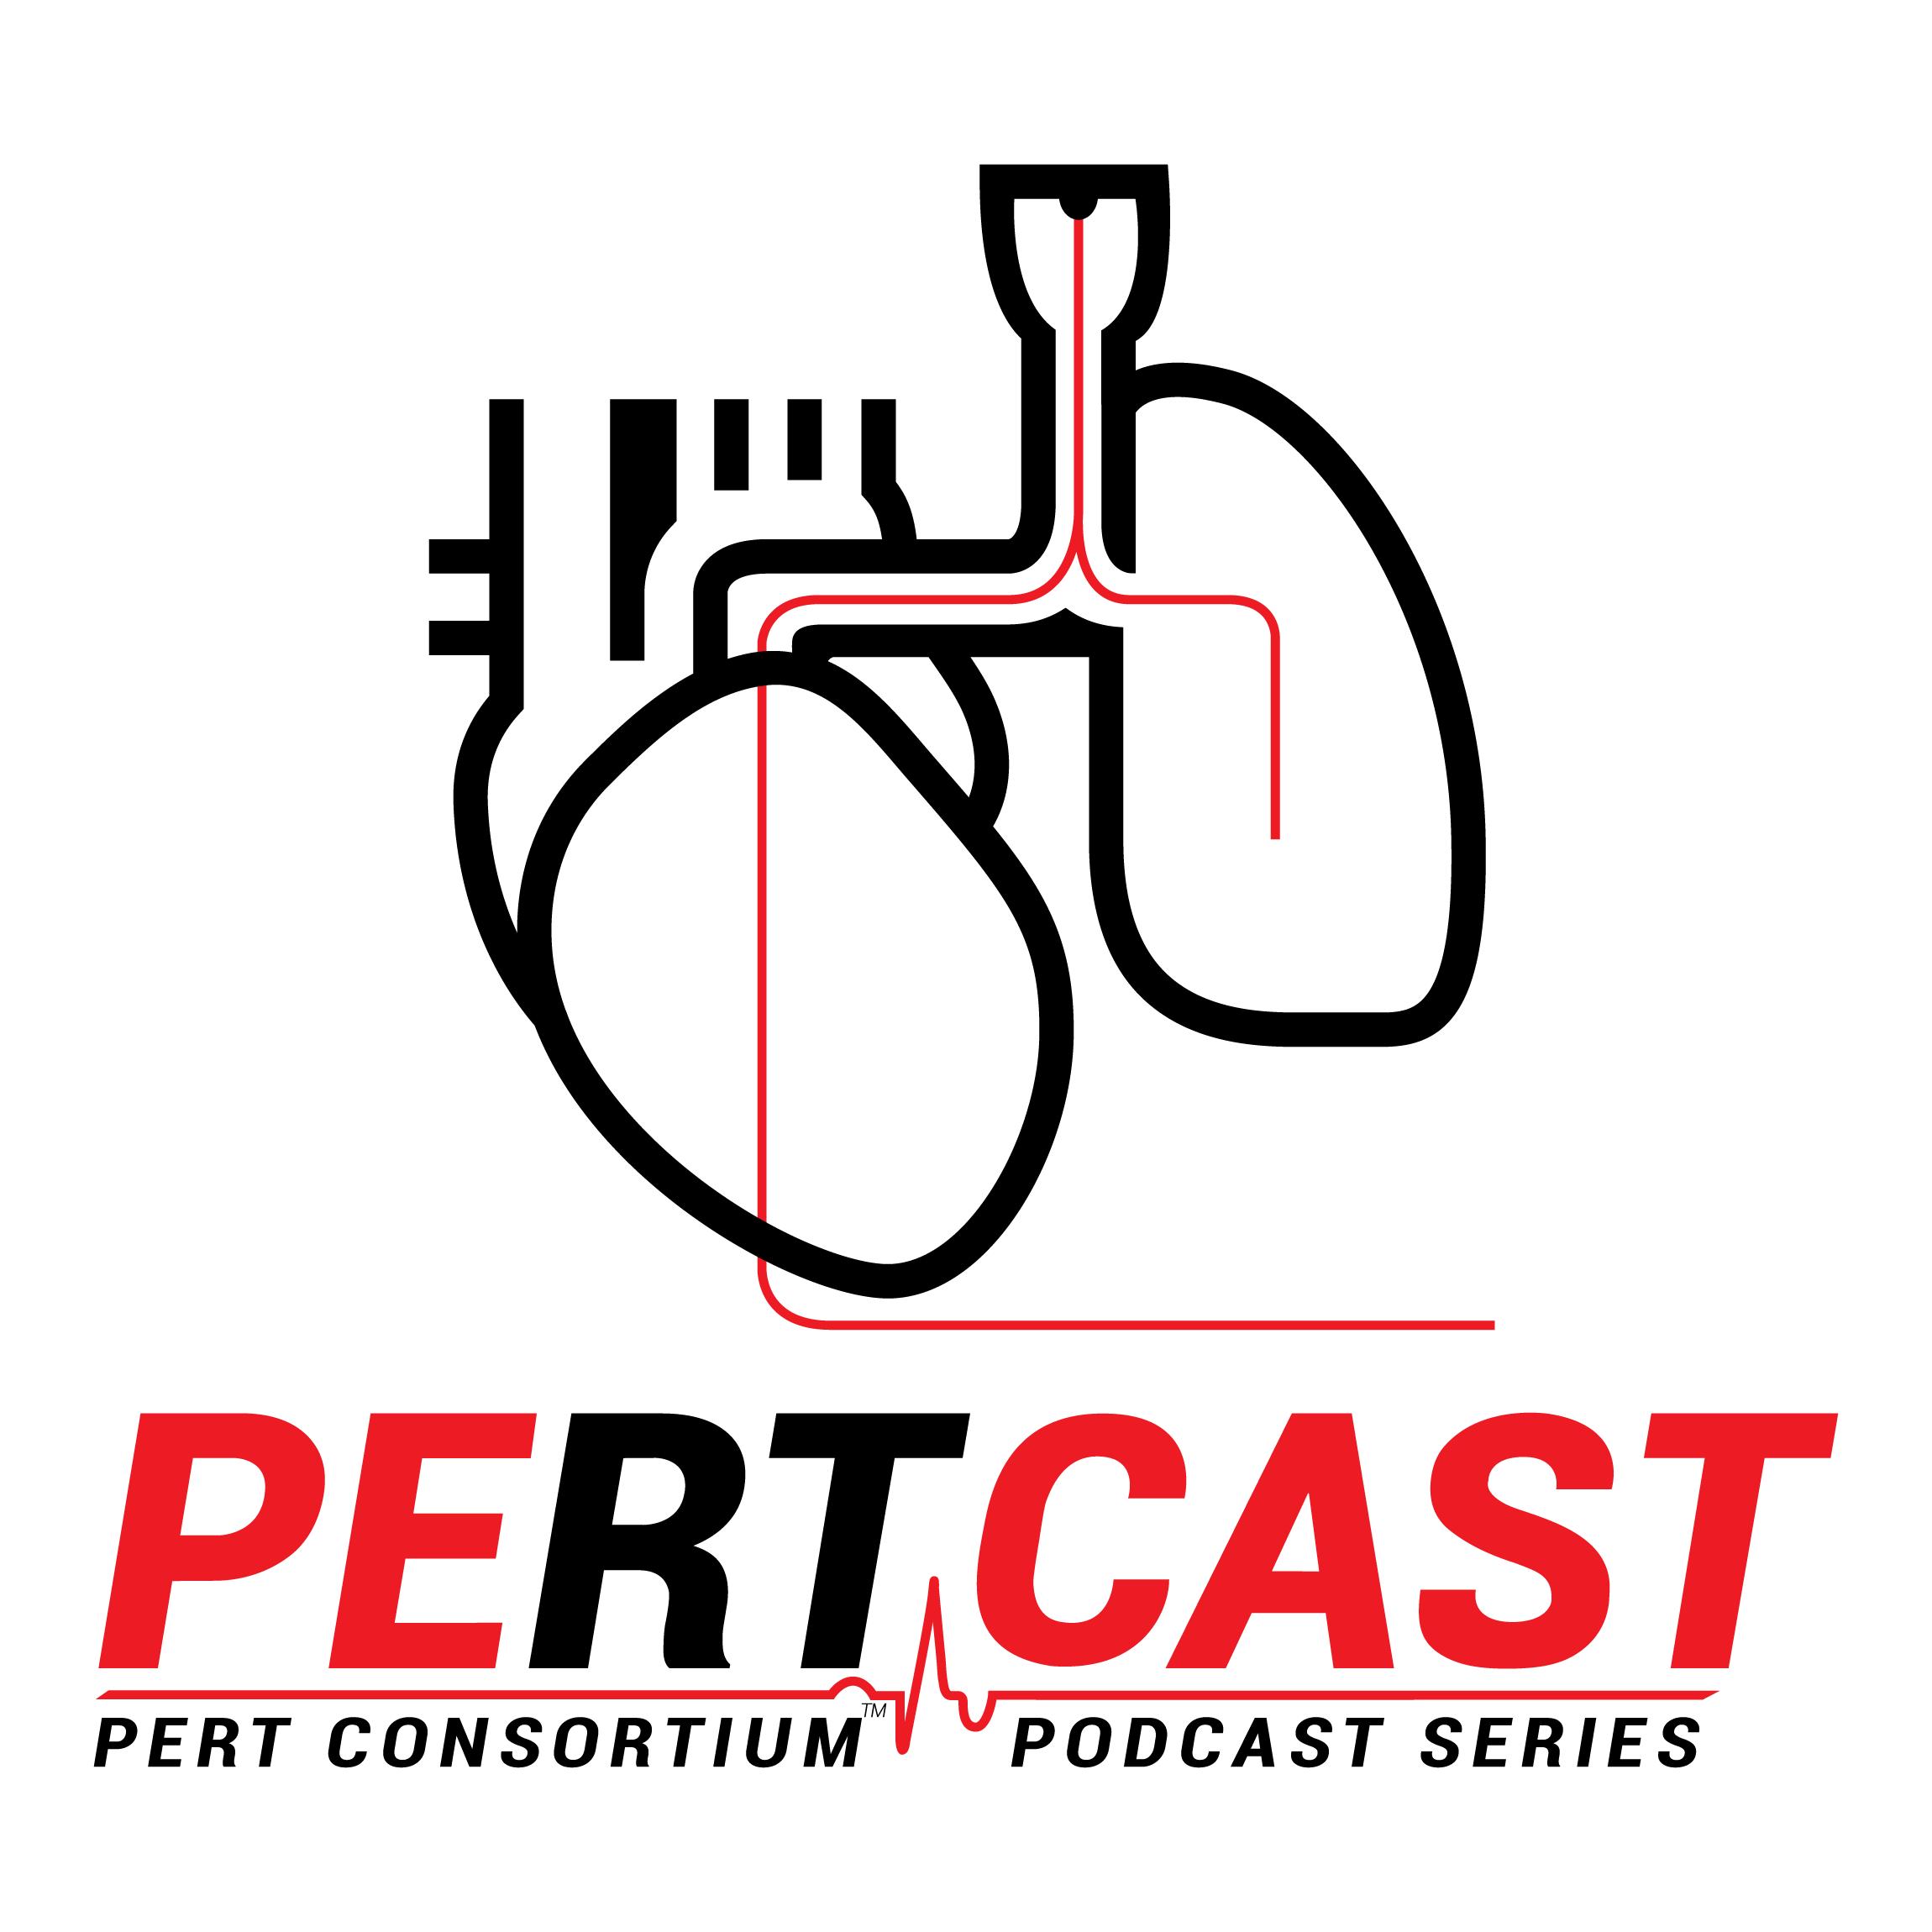 Artwork for Catheter-Directed Lysis: Oren Friedman interviews Ken Rosenfield